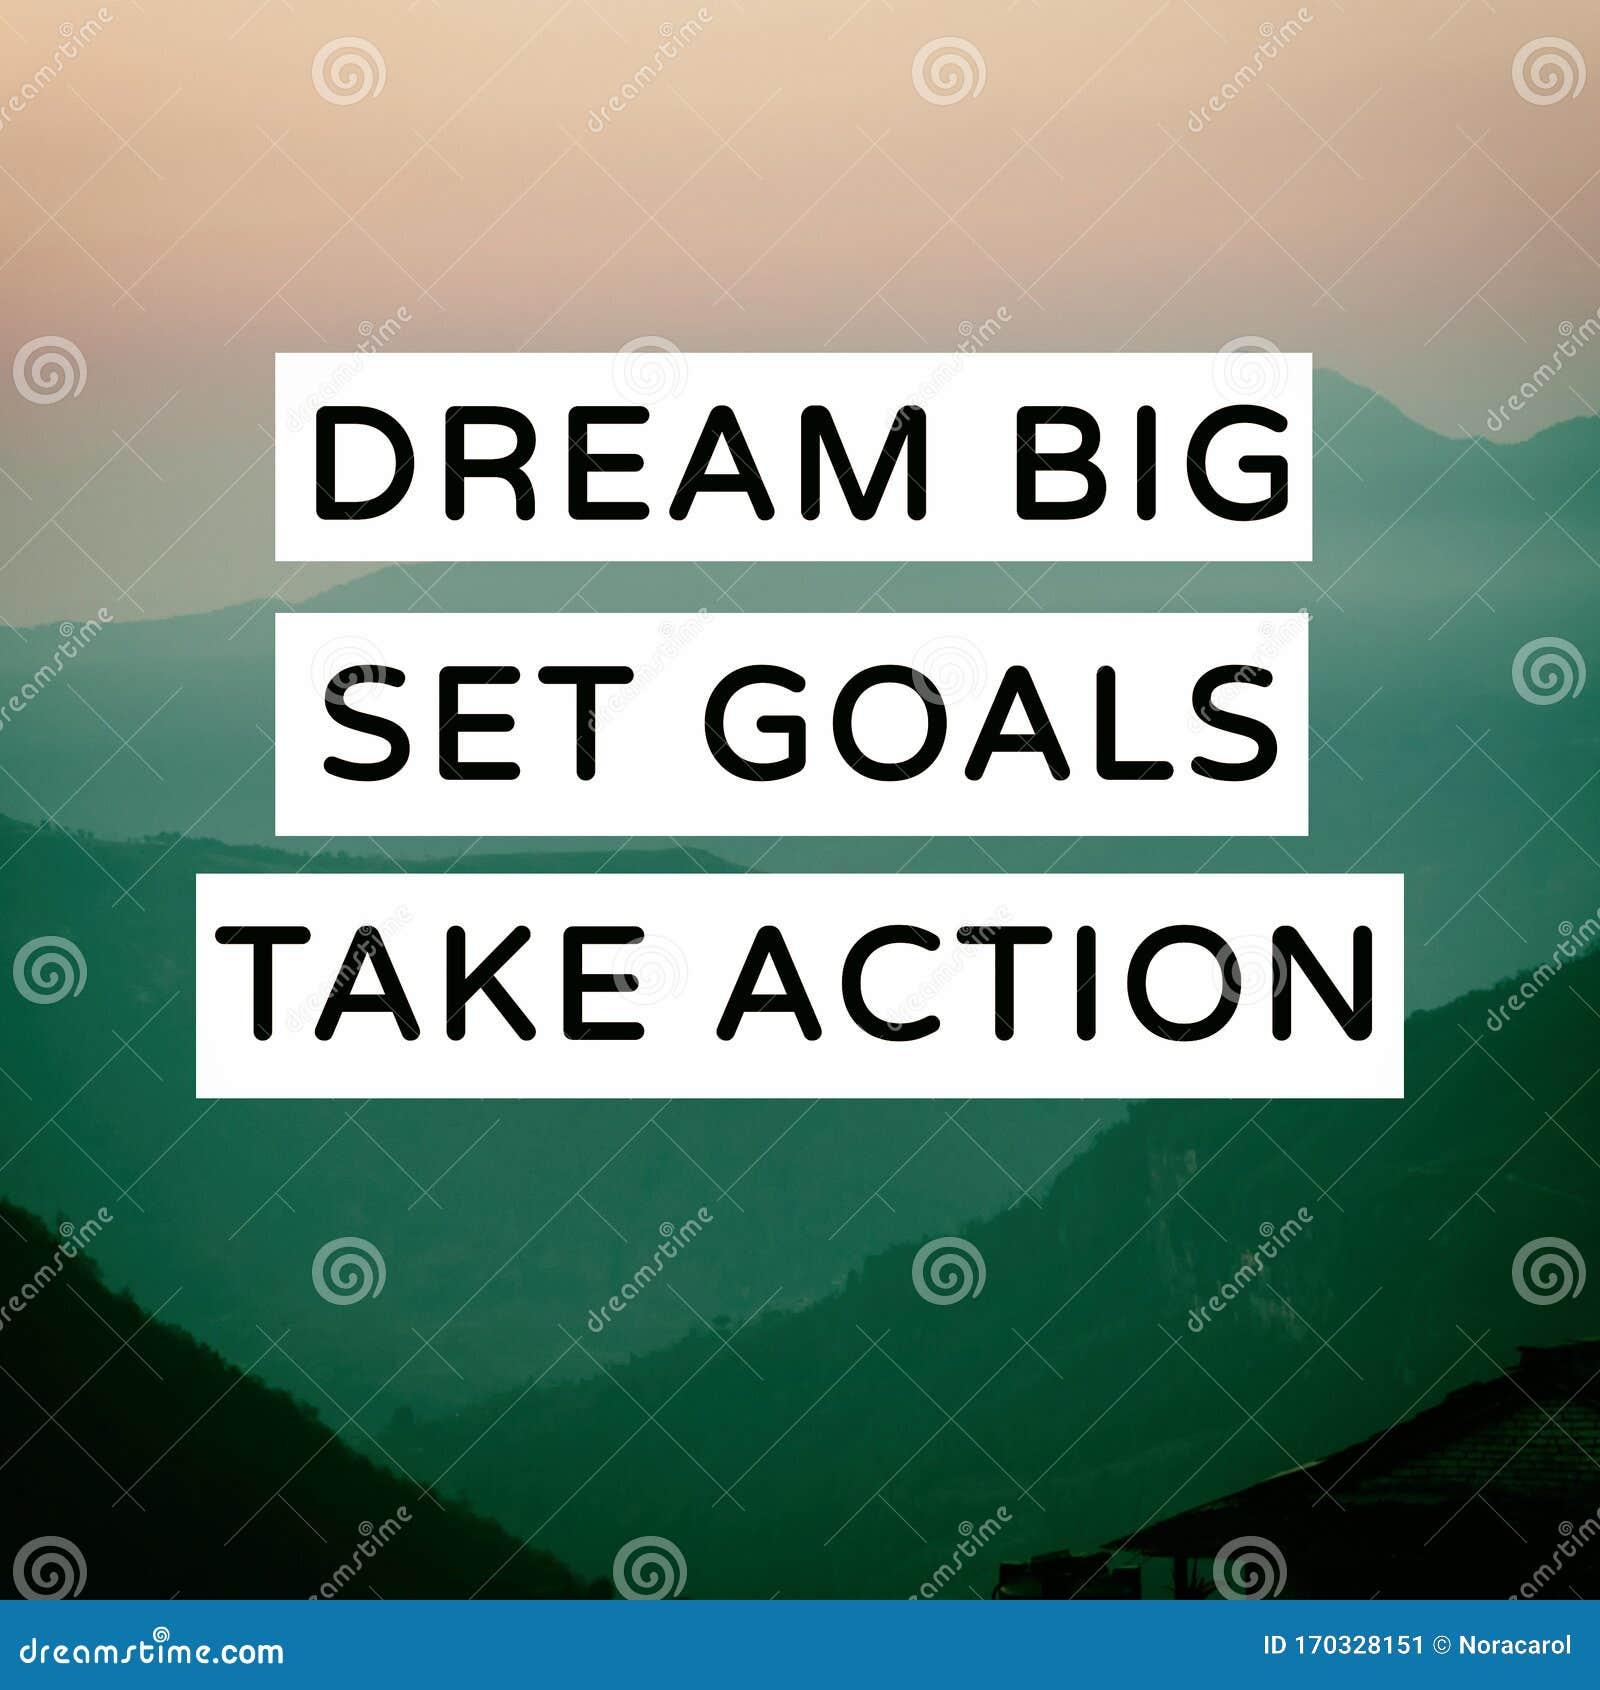 Motivational Quotes   Dream Big, Set Goals, Take Action. Blurry ...